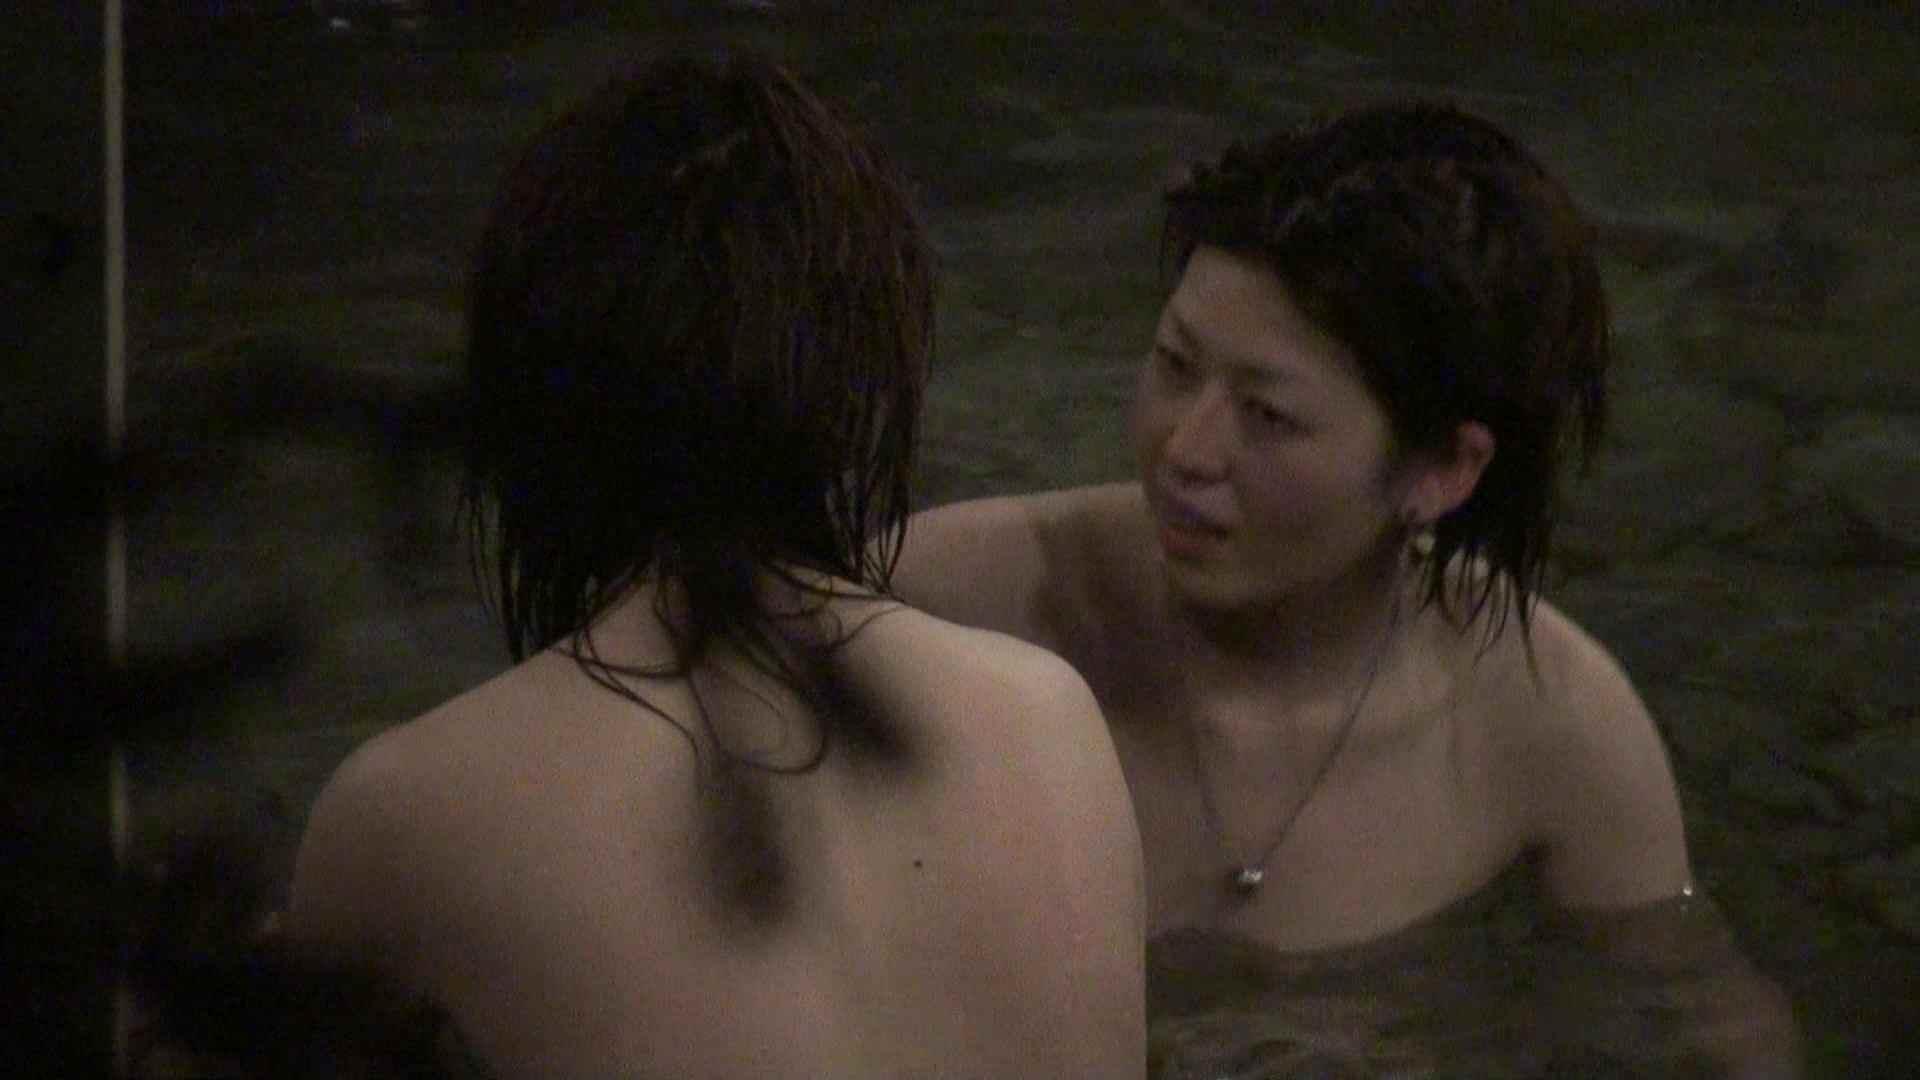 Aquaな露天風呂Vol.376 OLのエロ生活 | 露天風呂  109連発 64